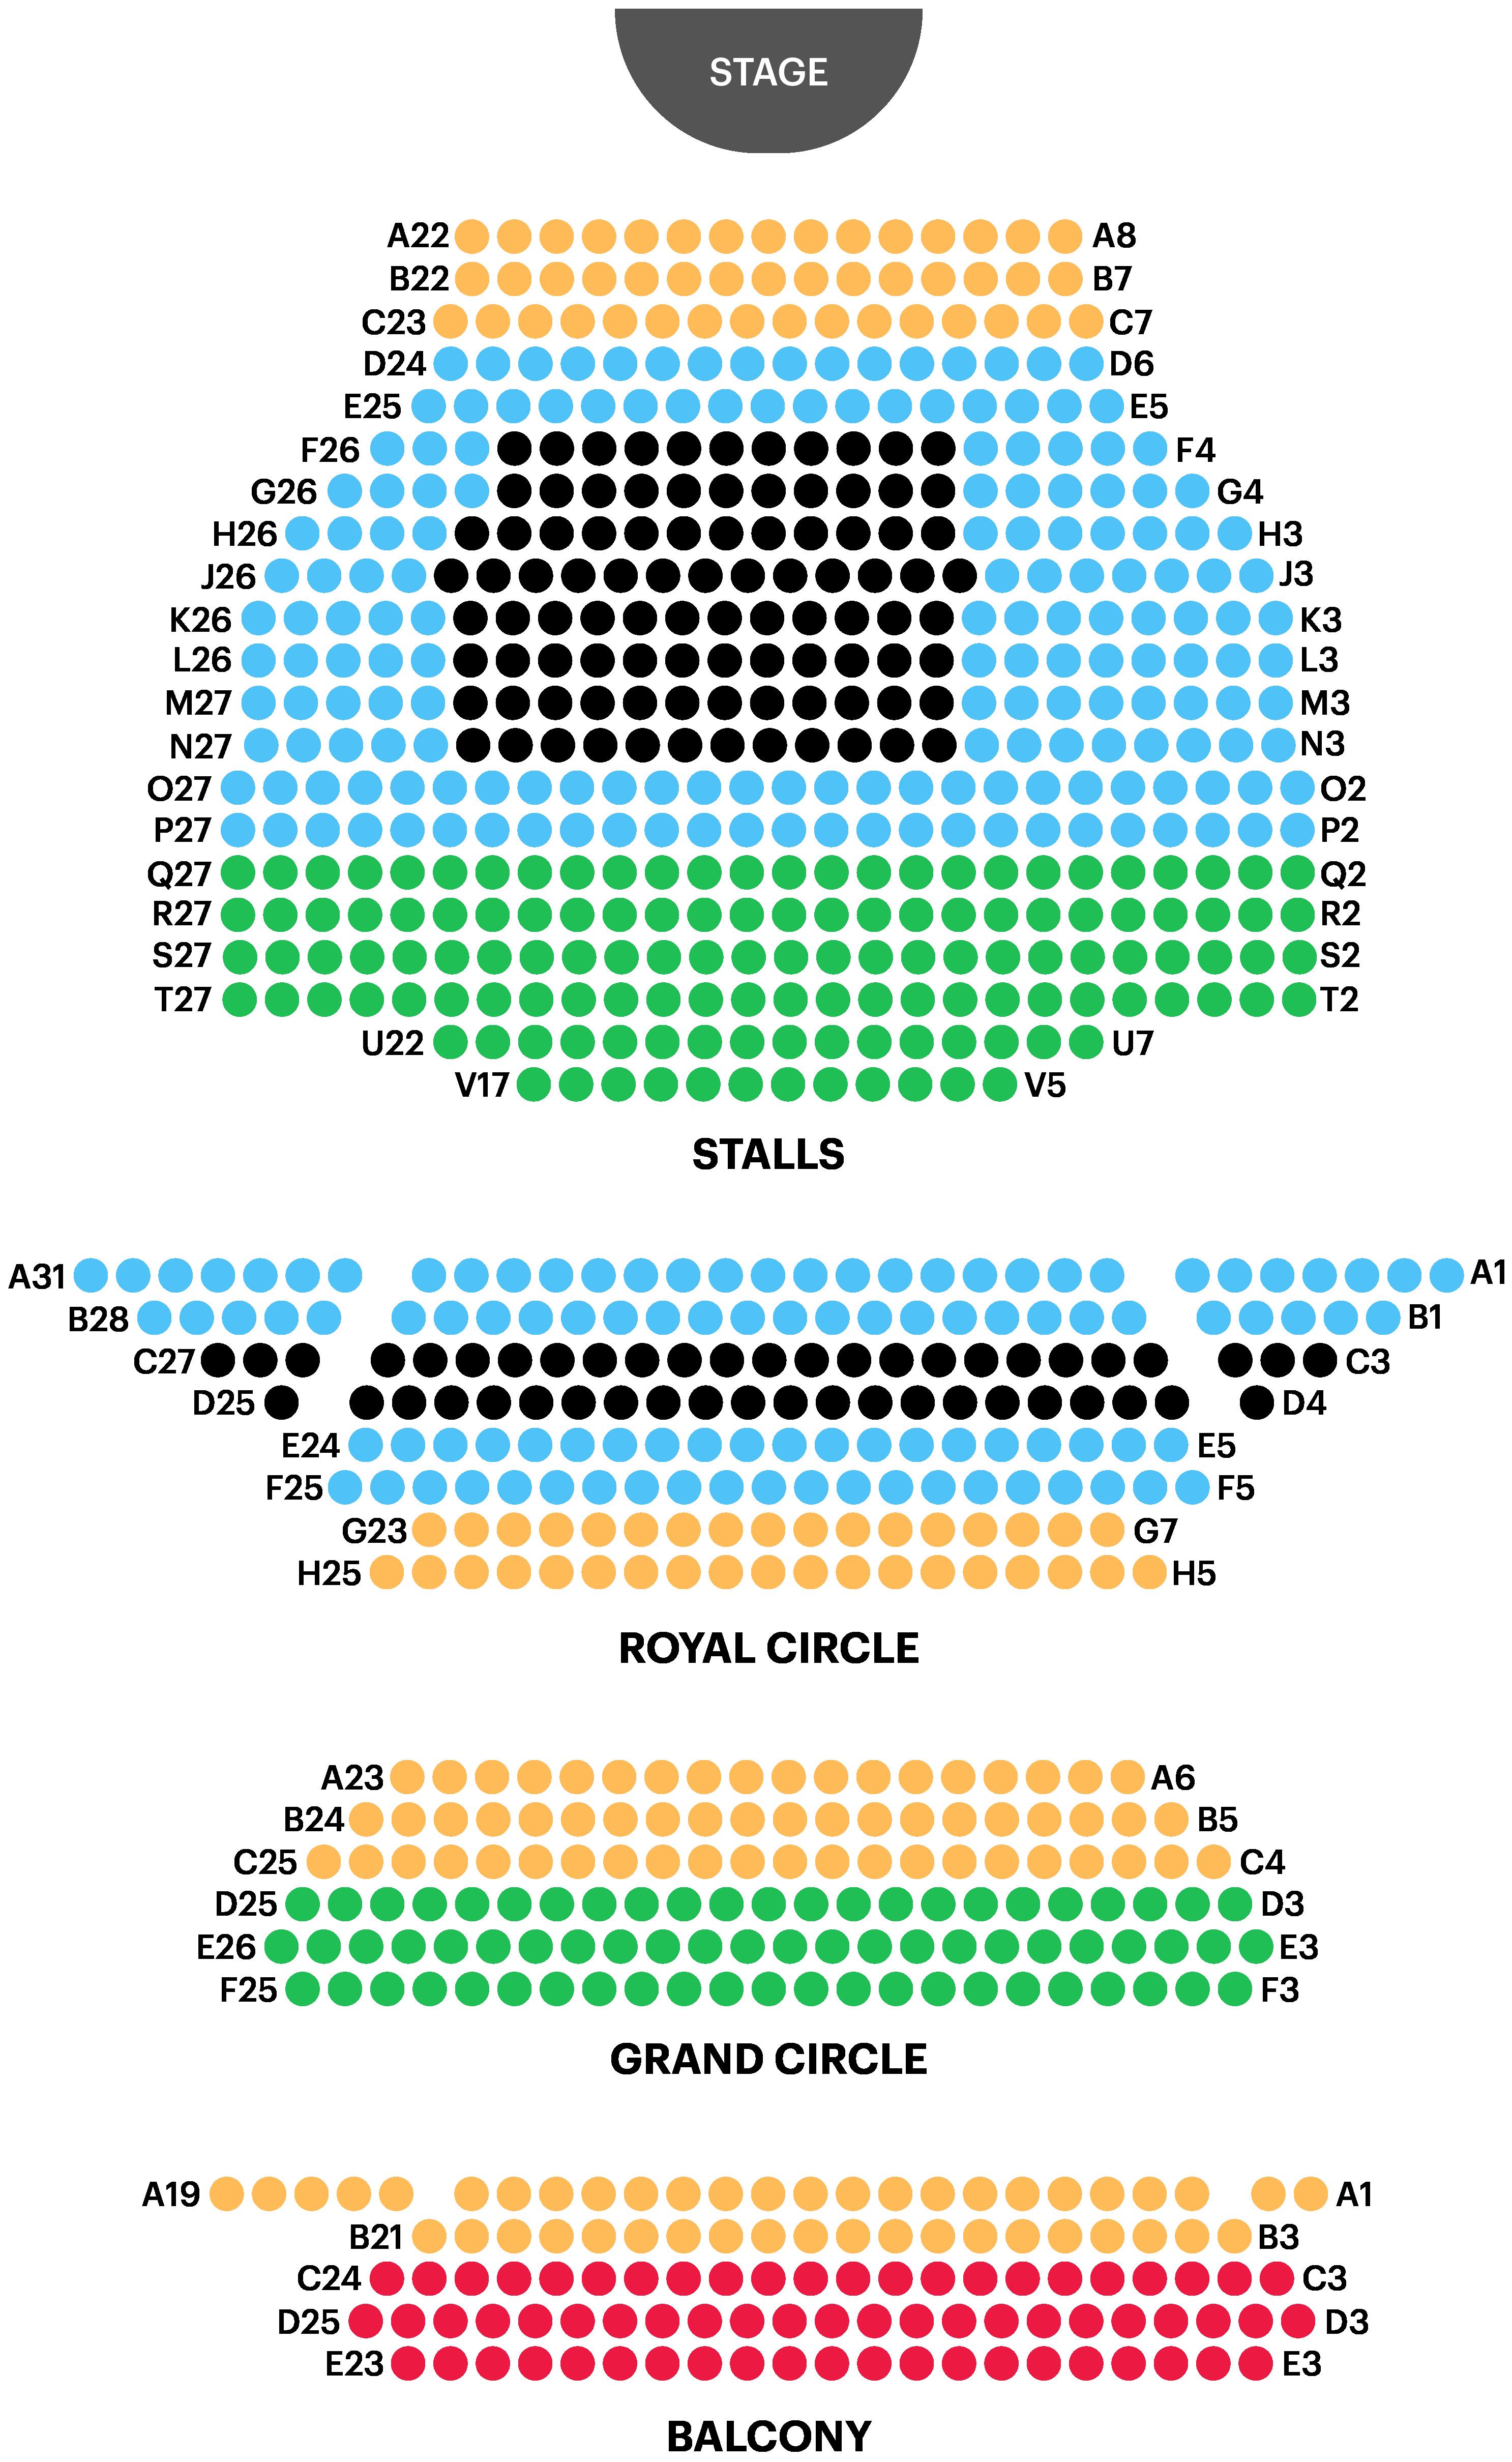 Noël Coward Theatre Seating Plan